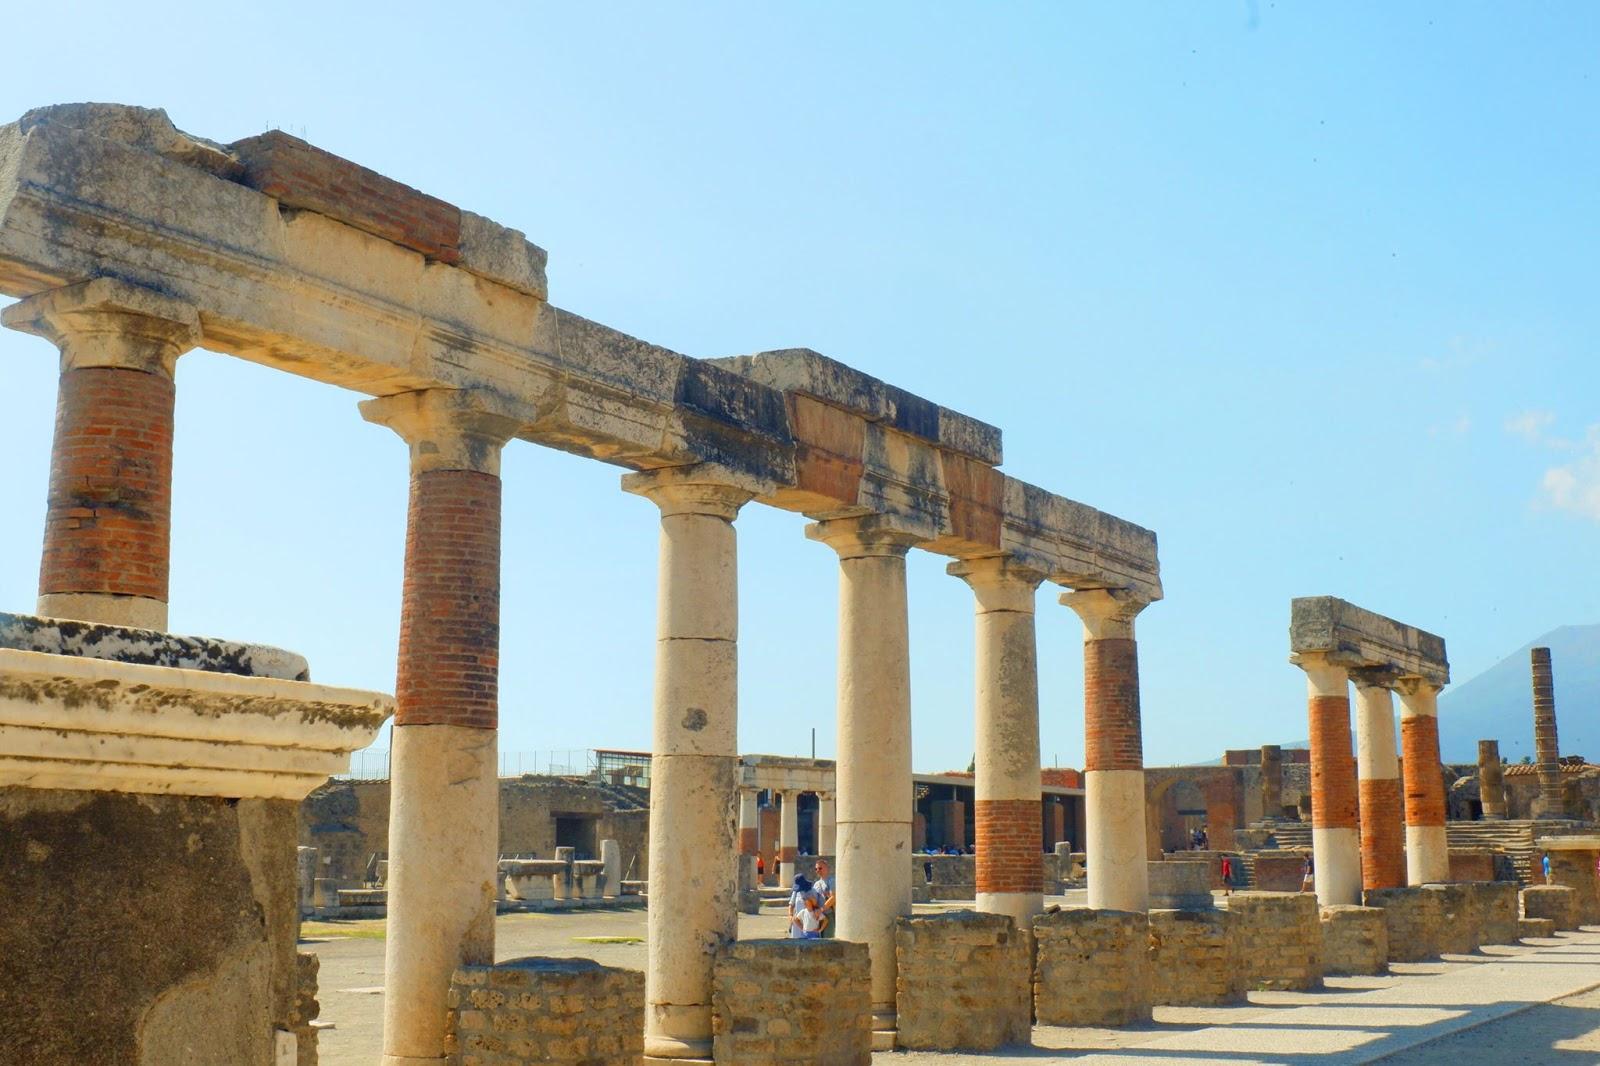 Forum area of Pompeii with columns